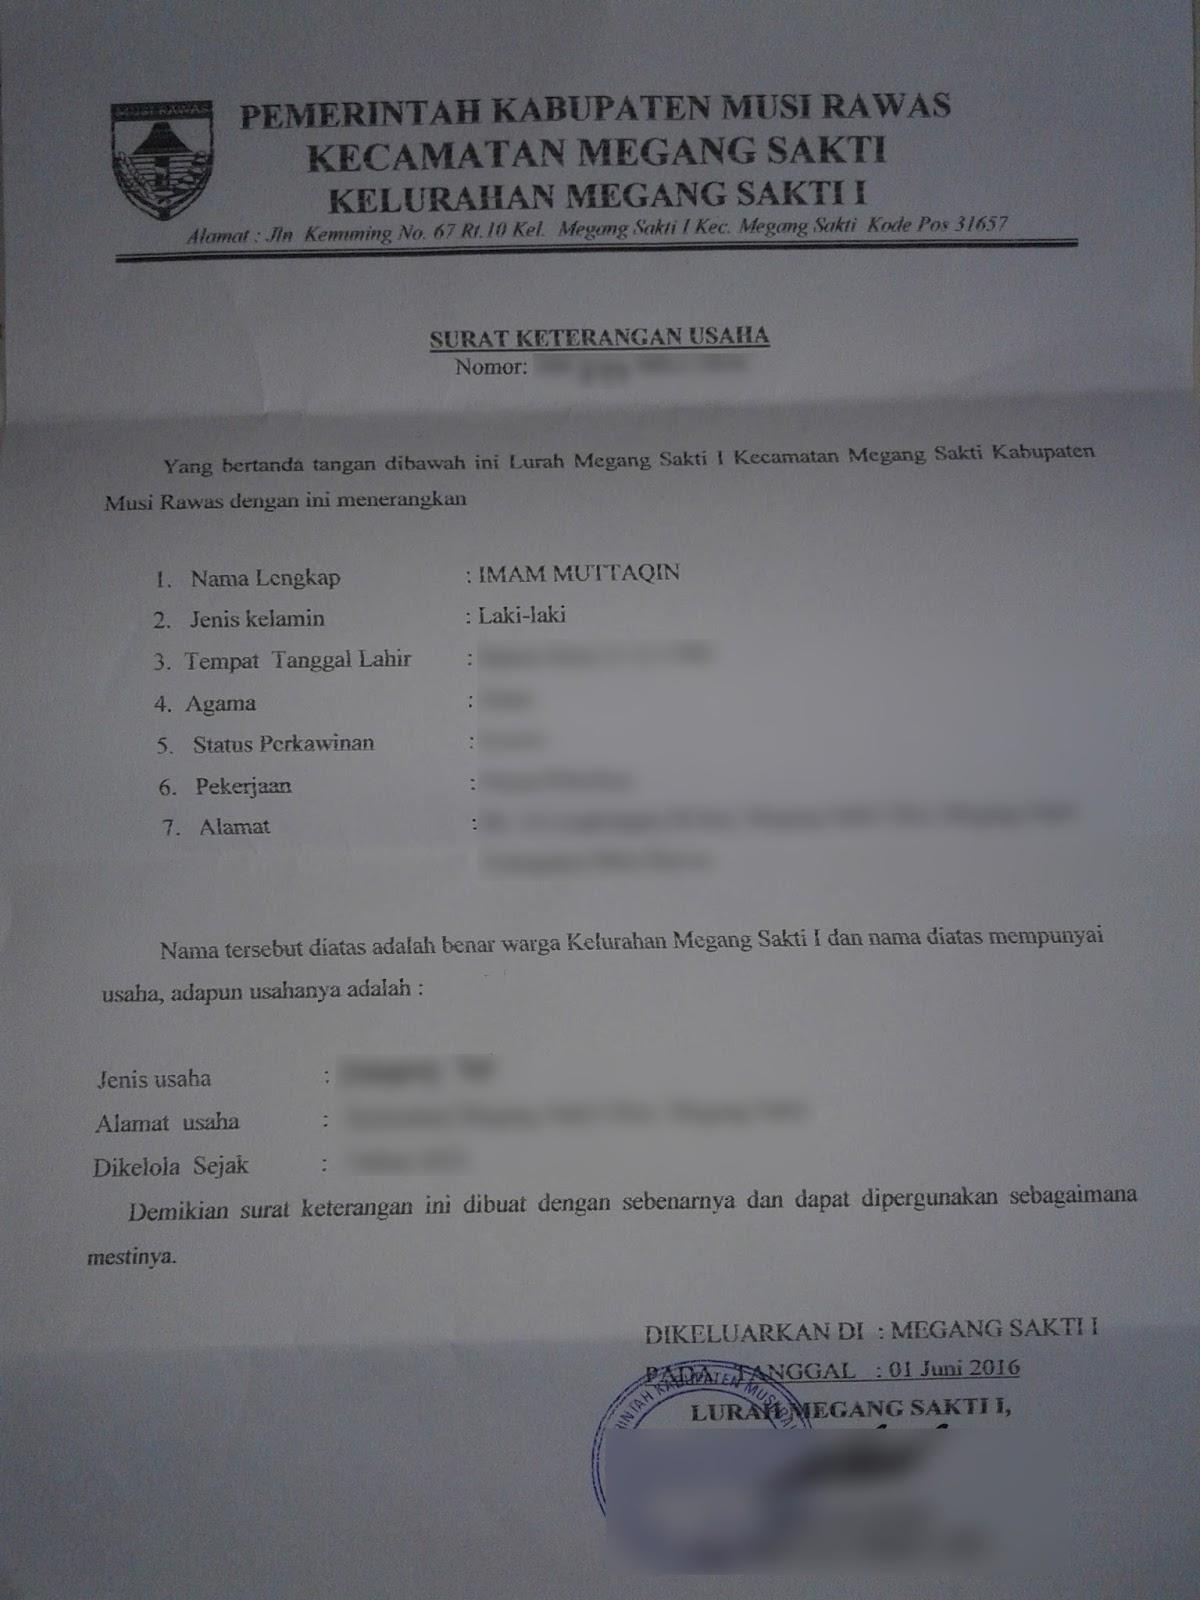 Contoh Surat Keterangan Usaha Untuk Kur Bri - Nusagates